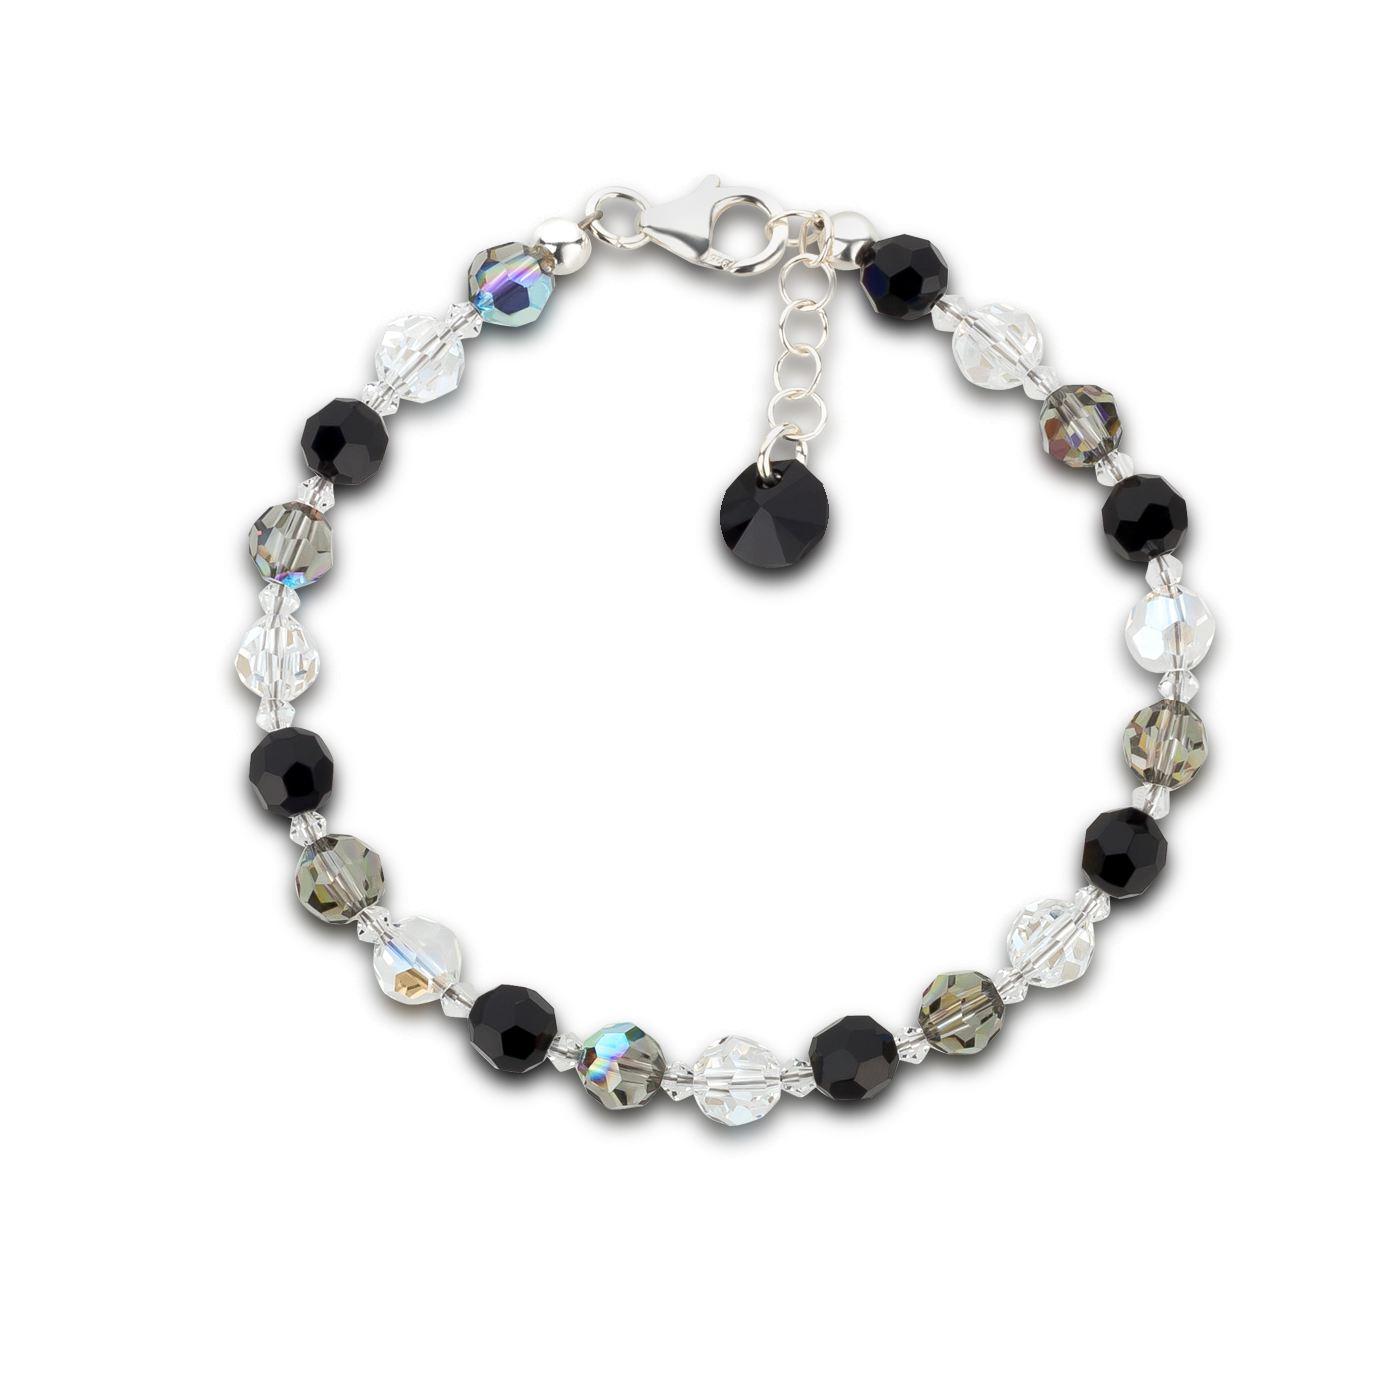 armband schwarz grau crystal aus 6mm swarovski kristallperlen. Black Bedroom Furniture Sets. Home Design Ideas